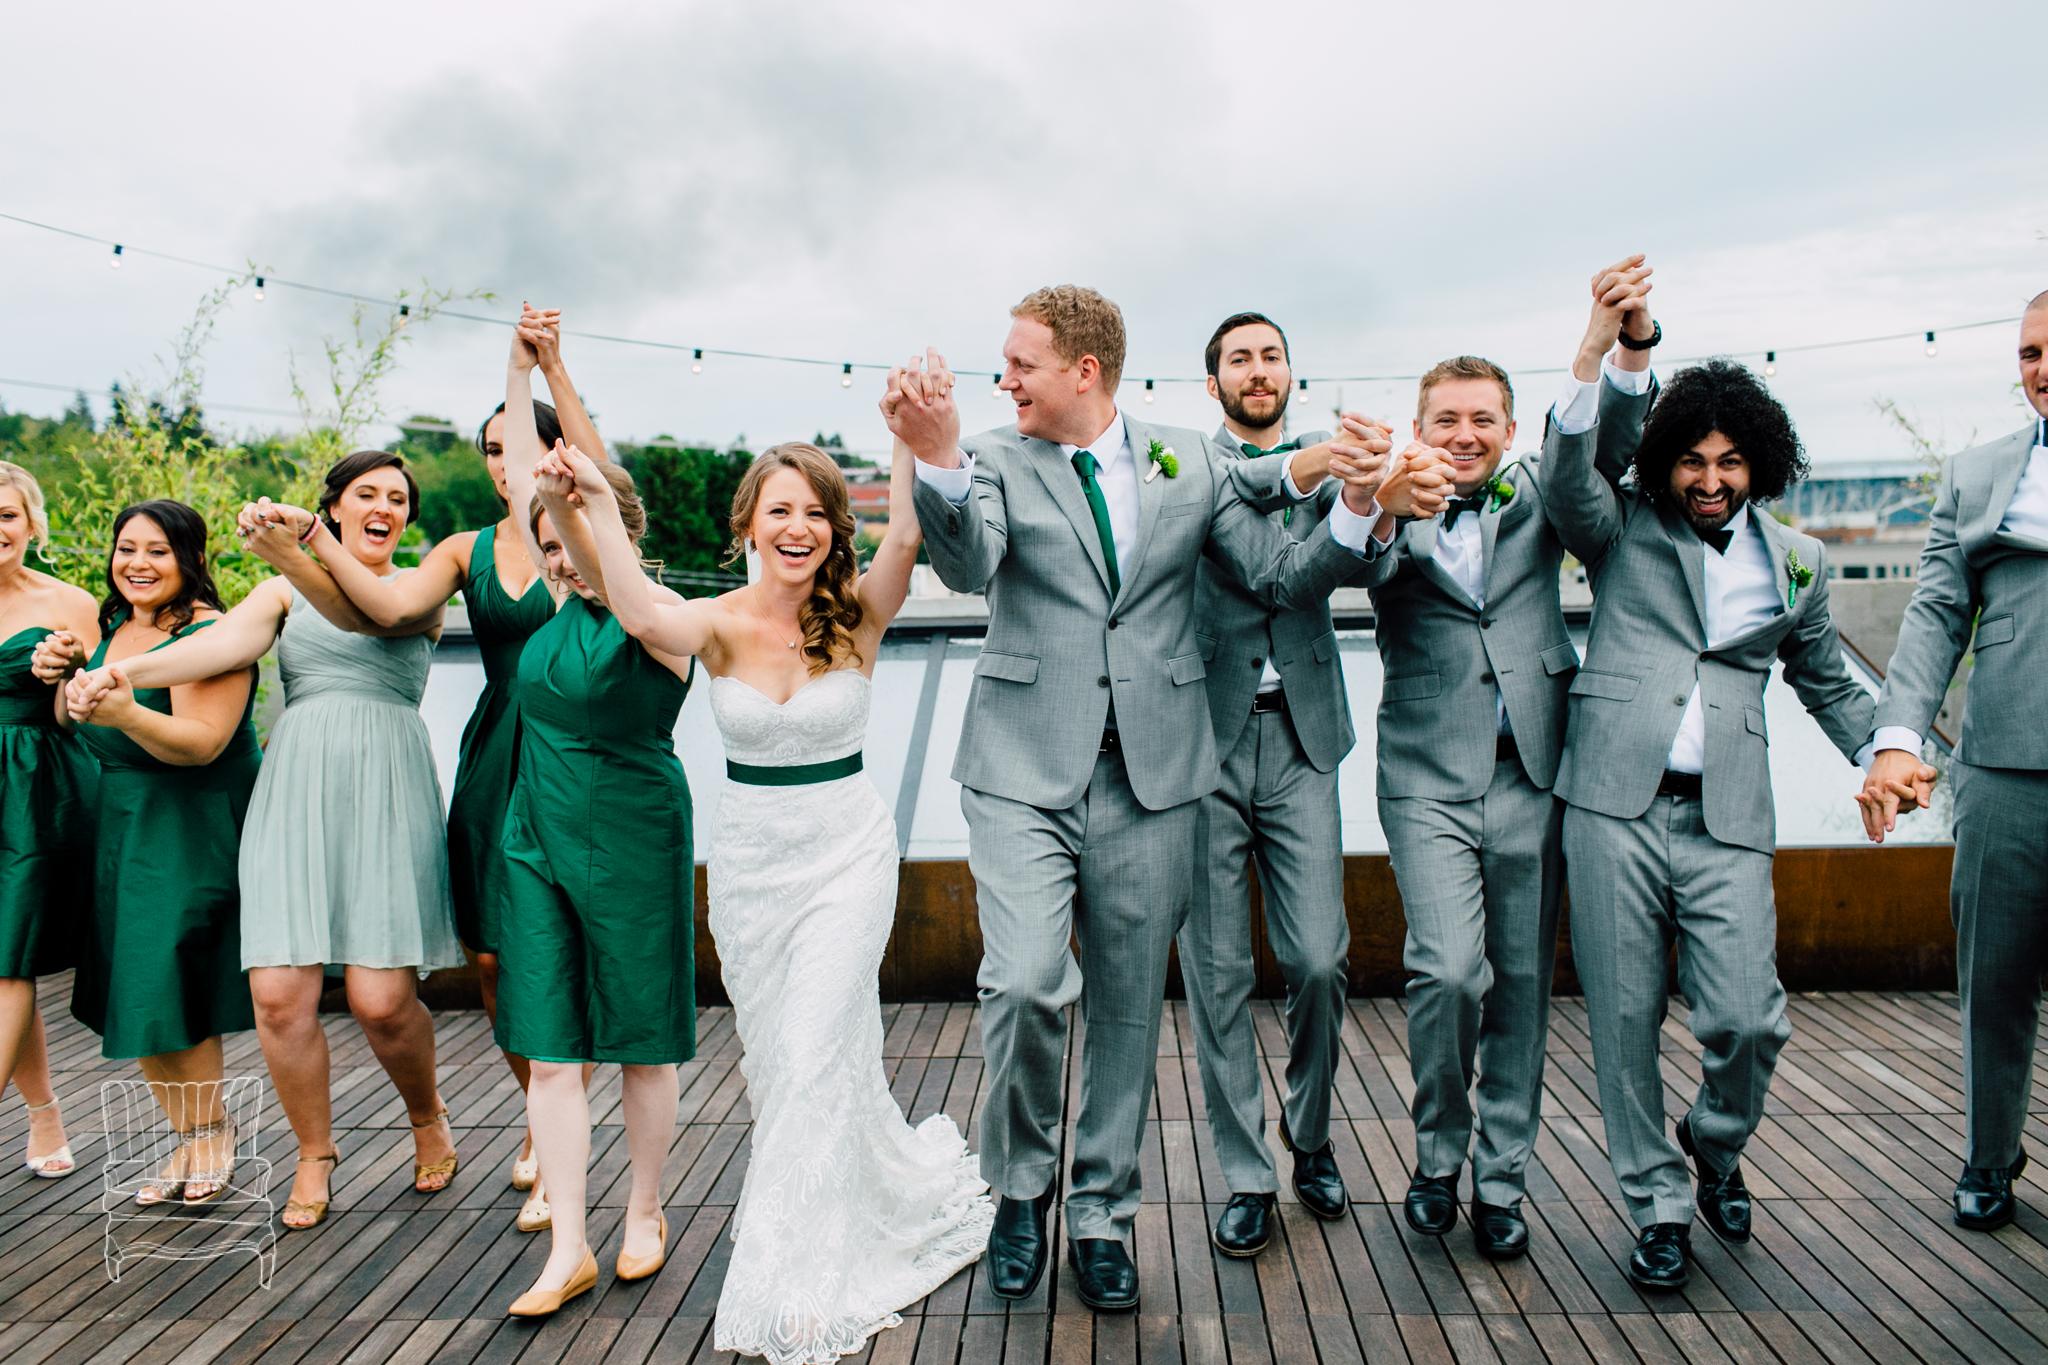 frdmont-foundry-seattle-wedding-katheryn-moran-photography-kait-4.jpg